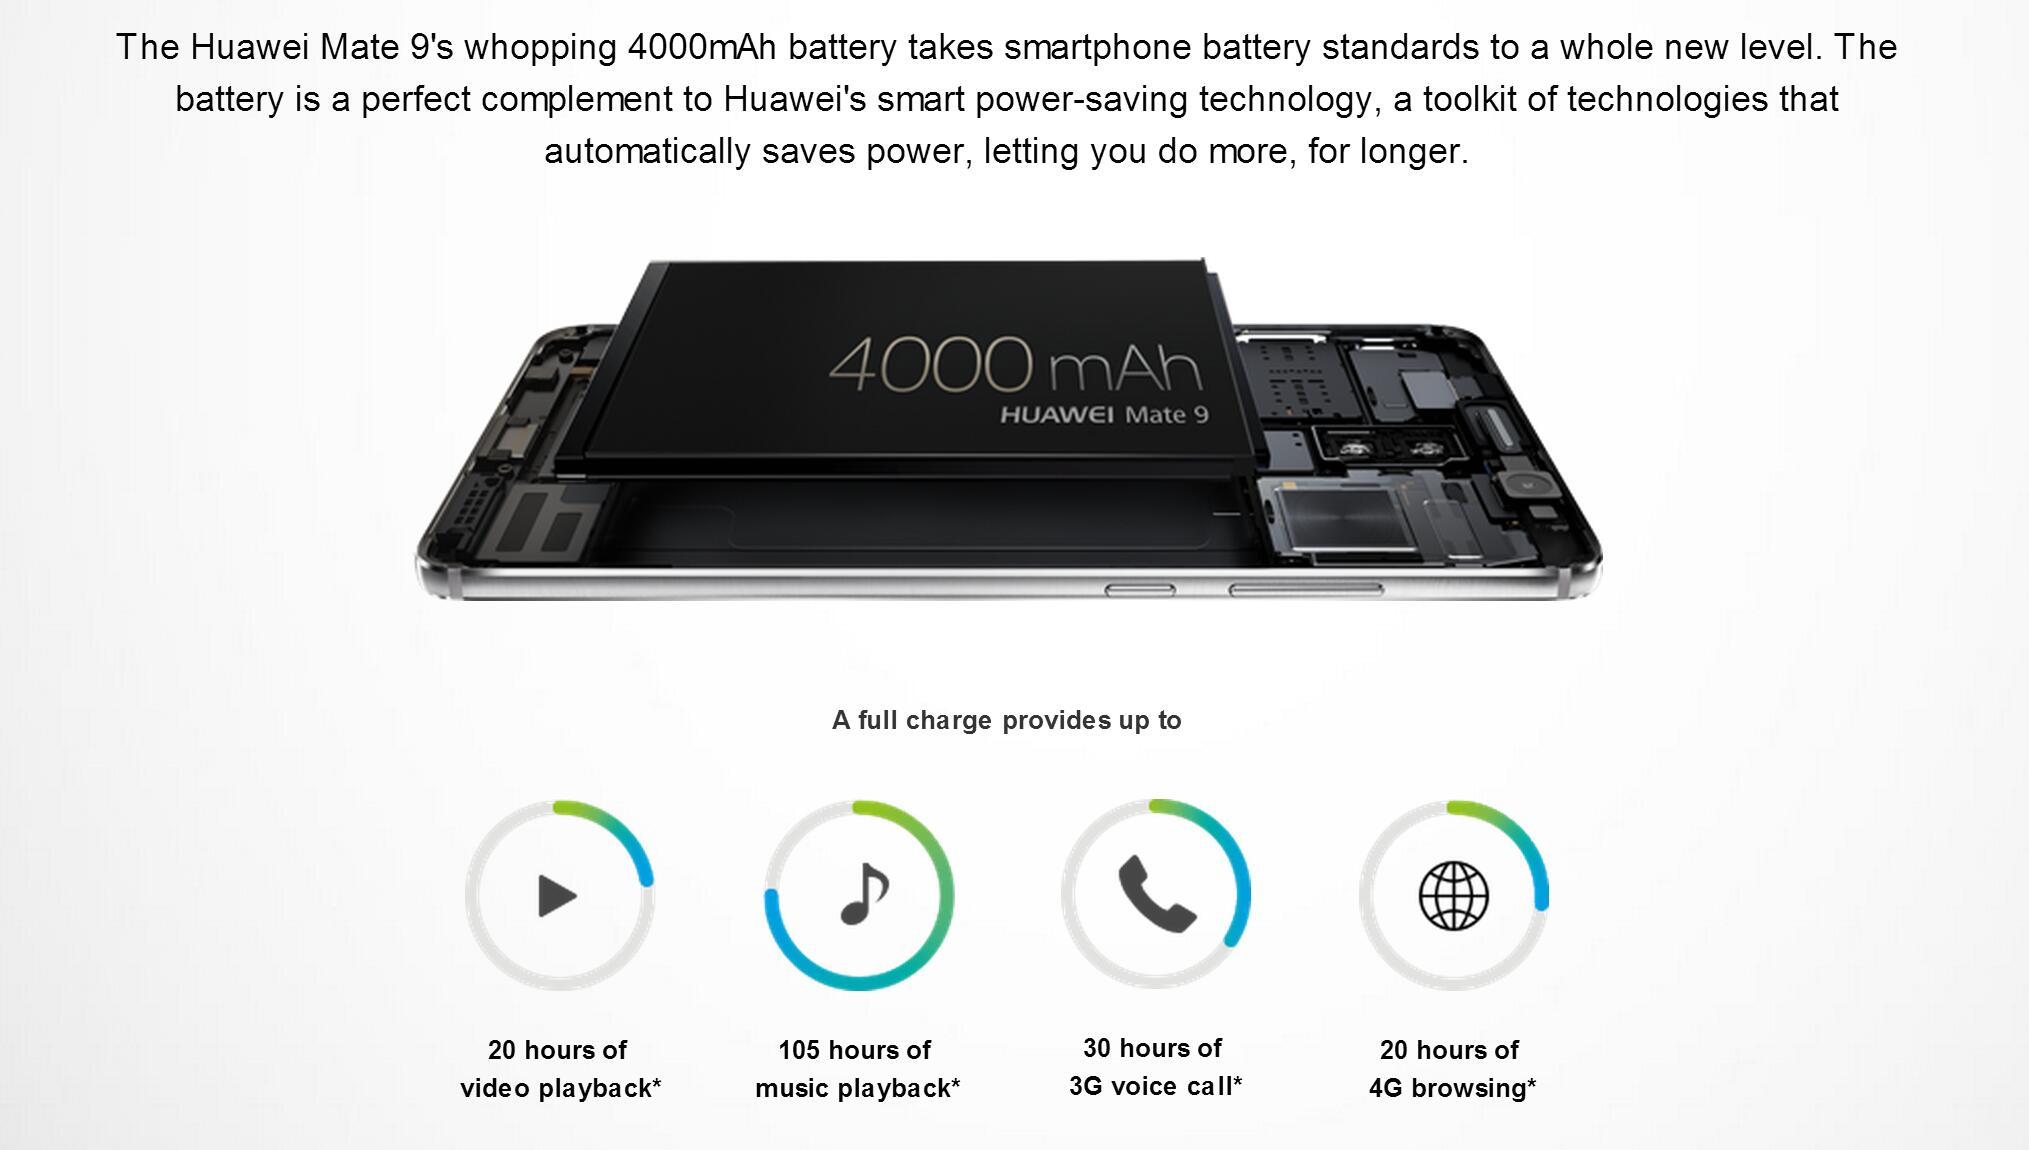 téléphone Huawei mate 9 discount